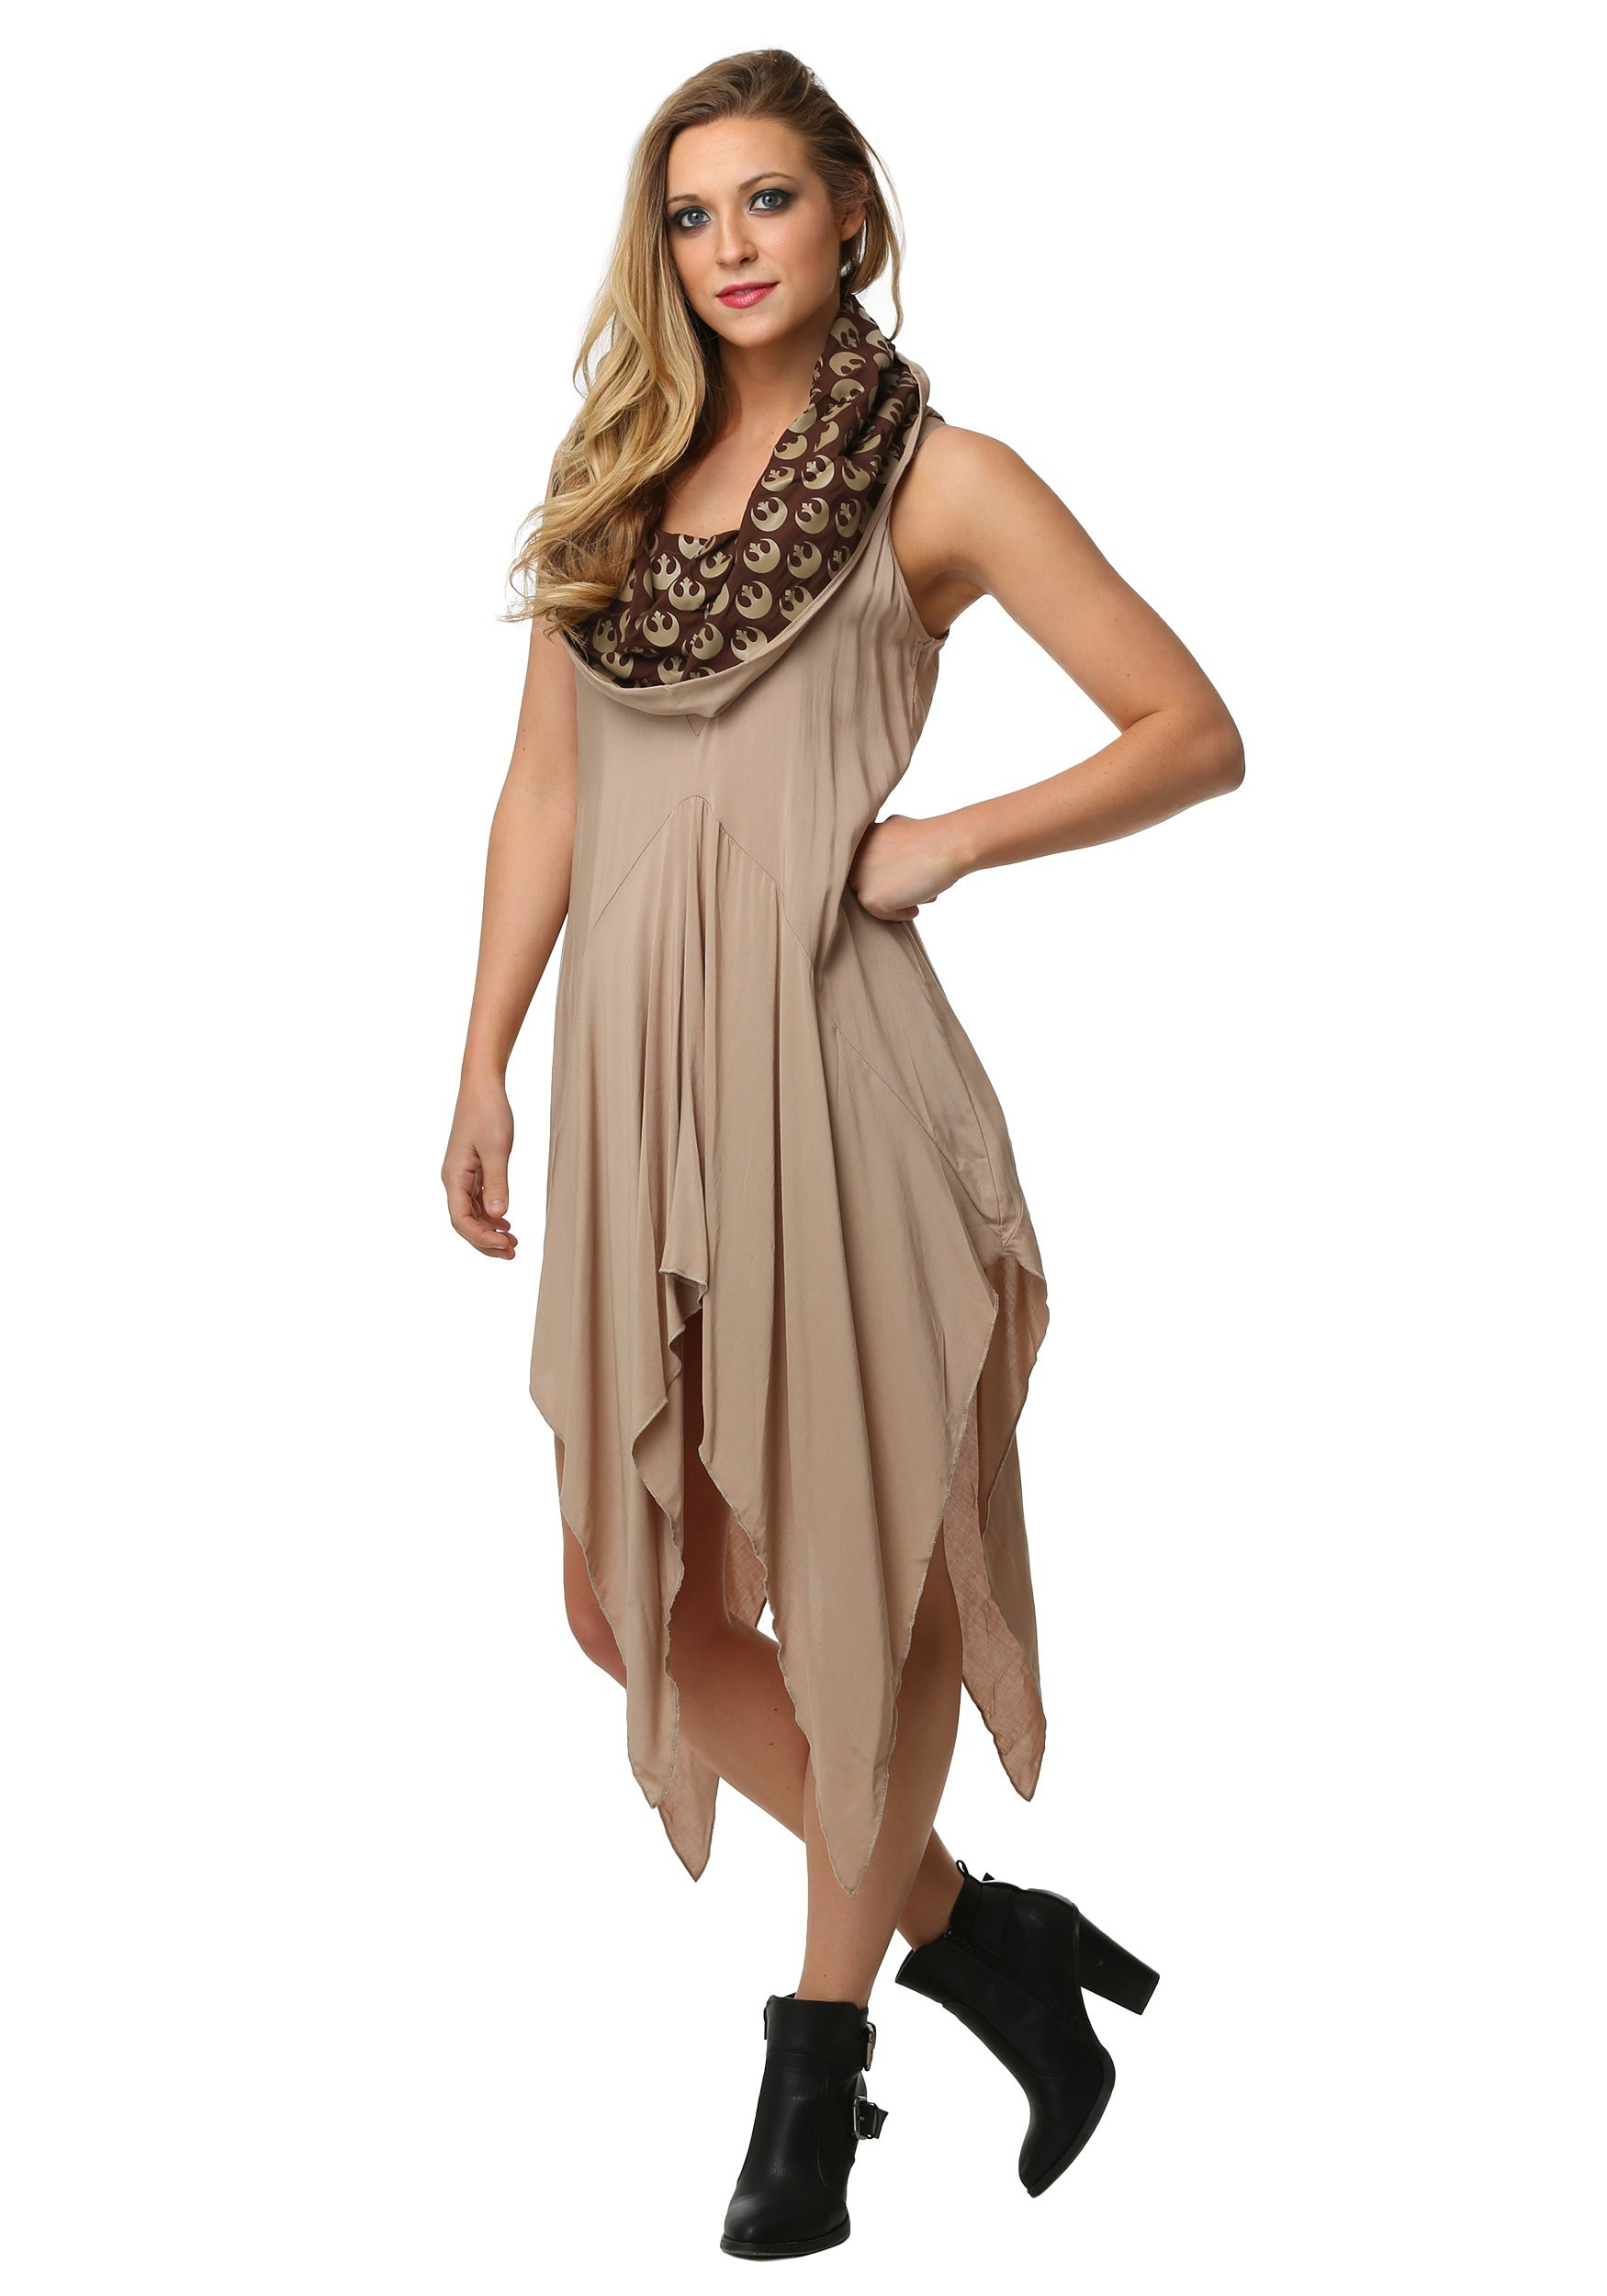 Womens Star Wars Rey Hooded Dress